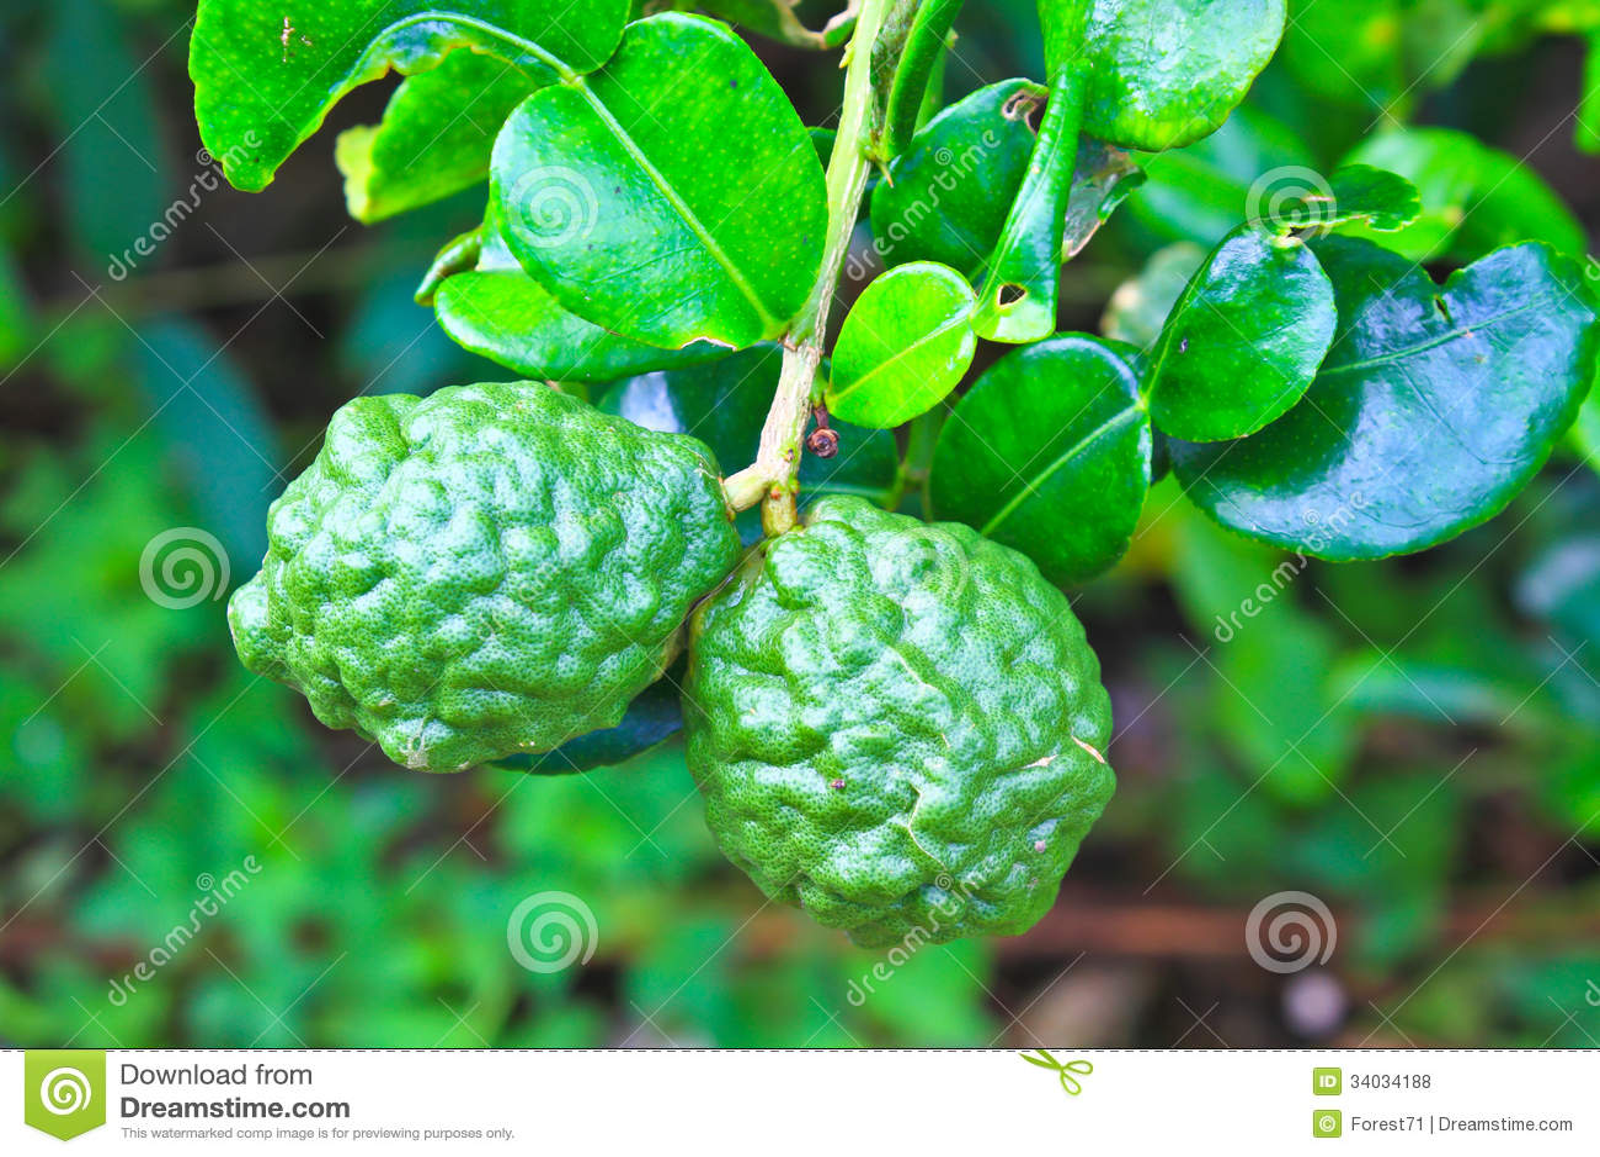 Leech Lime Or Bergamot Fruits On Tree Royalty Free Stock ... Leeches Fruit Tree